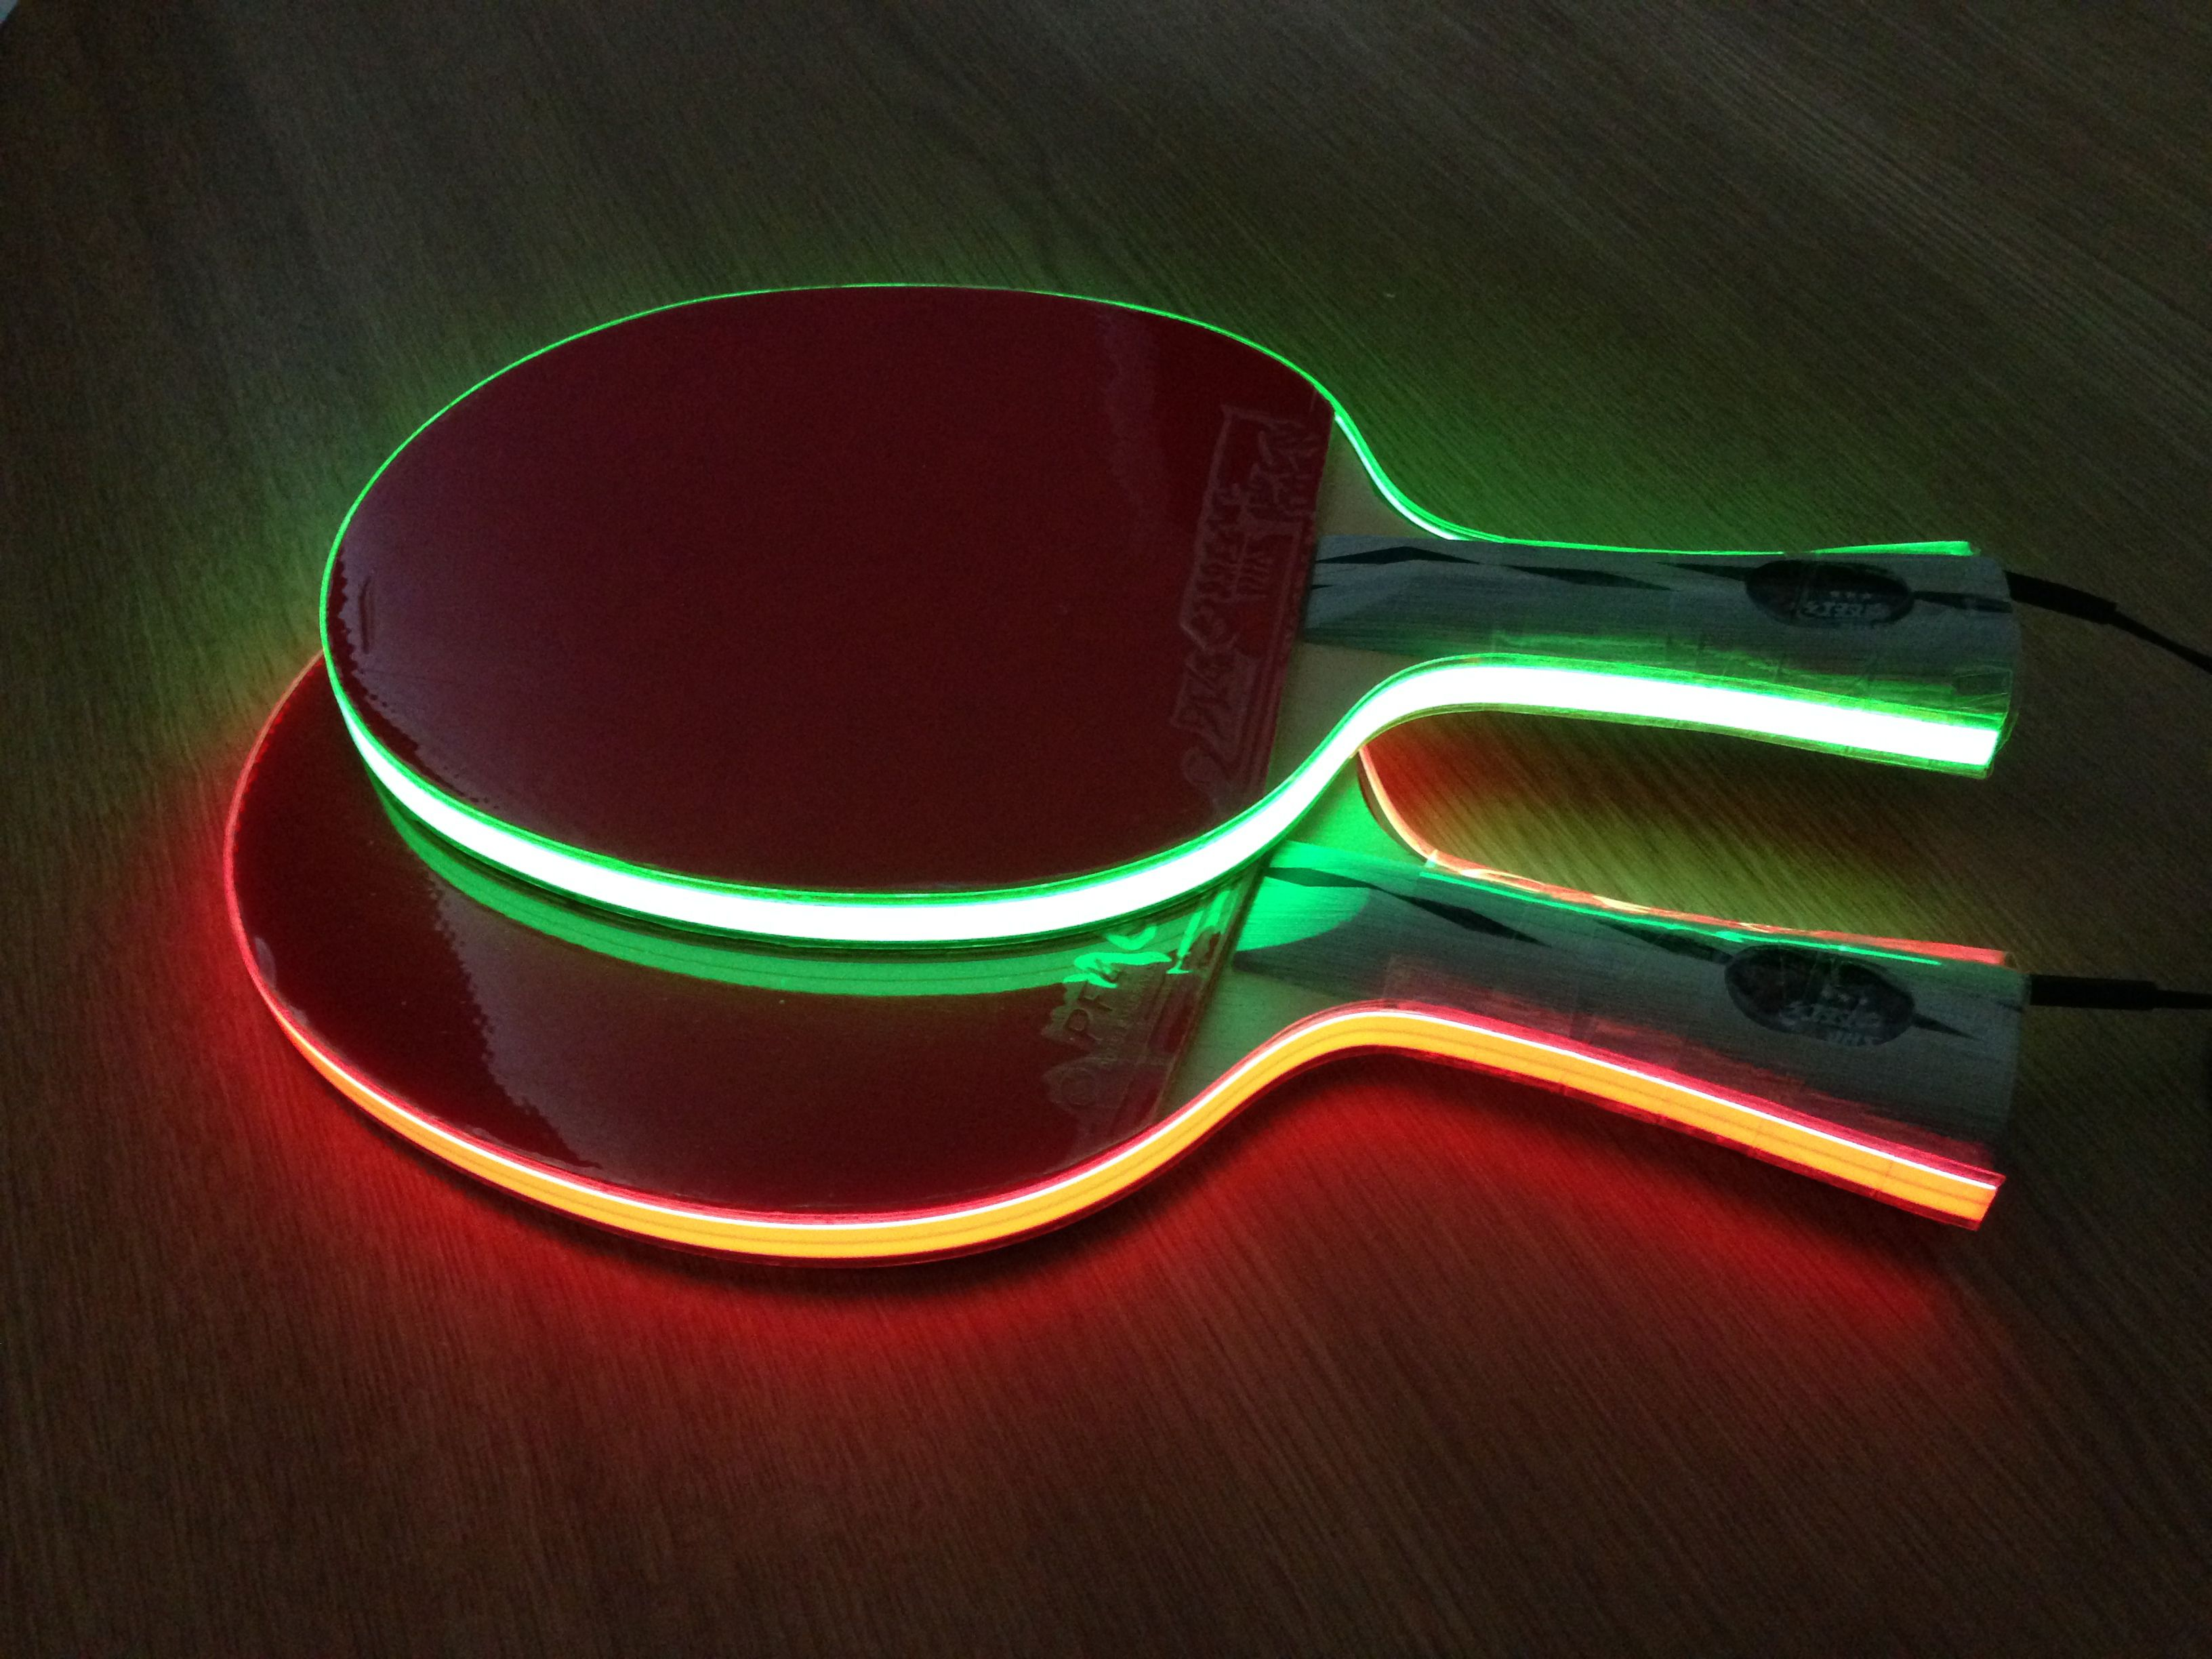 Light Tape Table Tennis Bats Http Www Lighttape Co Uk Table Tennis Table Tennis Bats Tennis